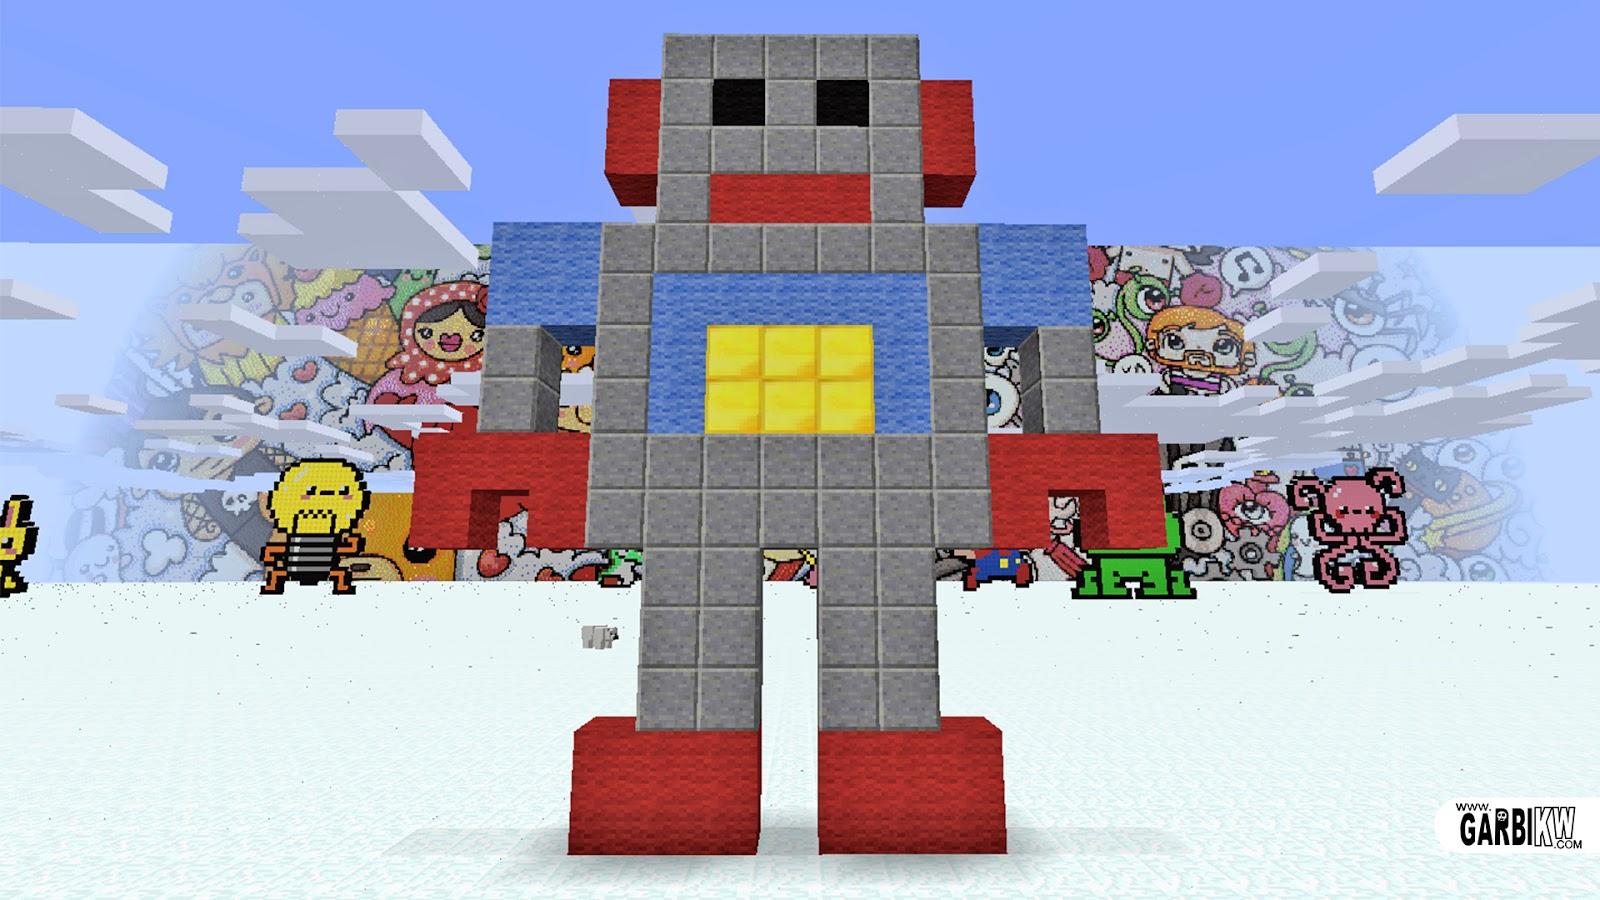 Minecraft Pixel Art   How To Make A Robot Minecraft Pixel Art   Cómo Hacer  Un Robot Minecraft Pixel Art   Comment Faire Un Robot